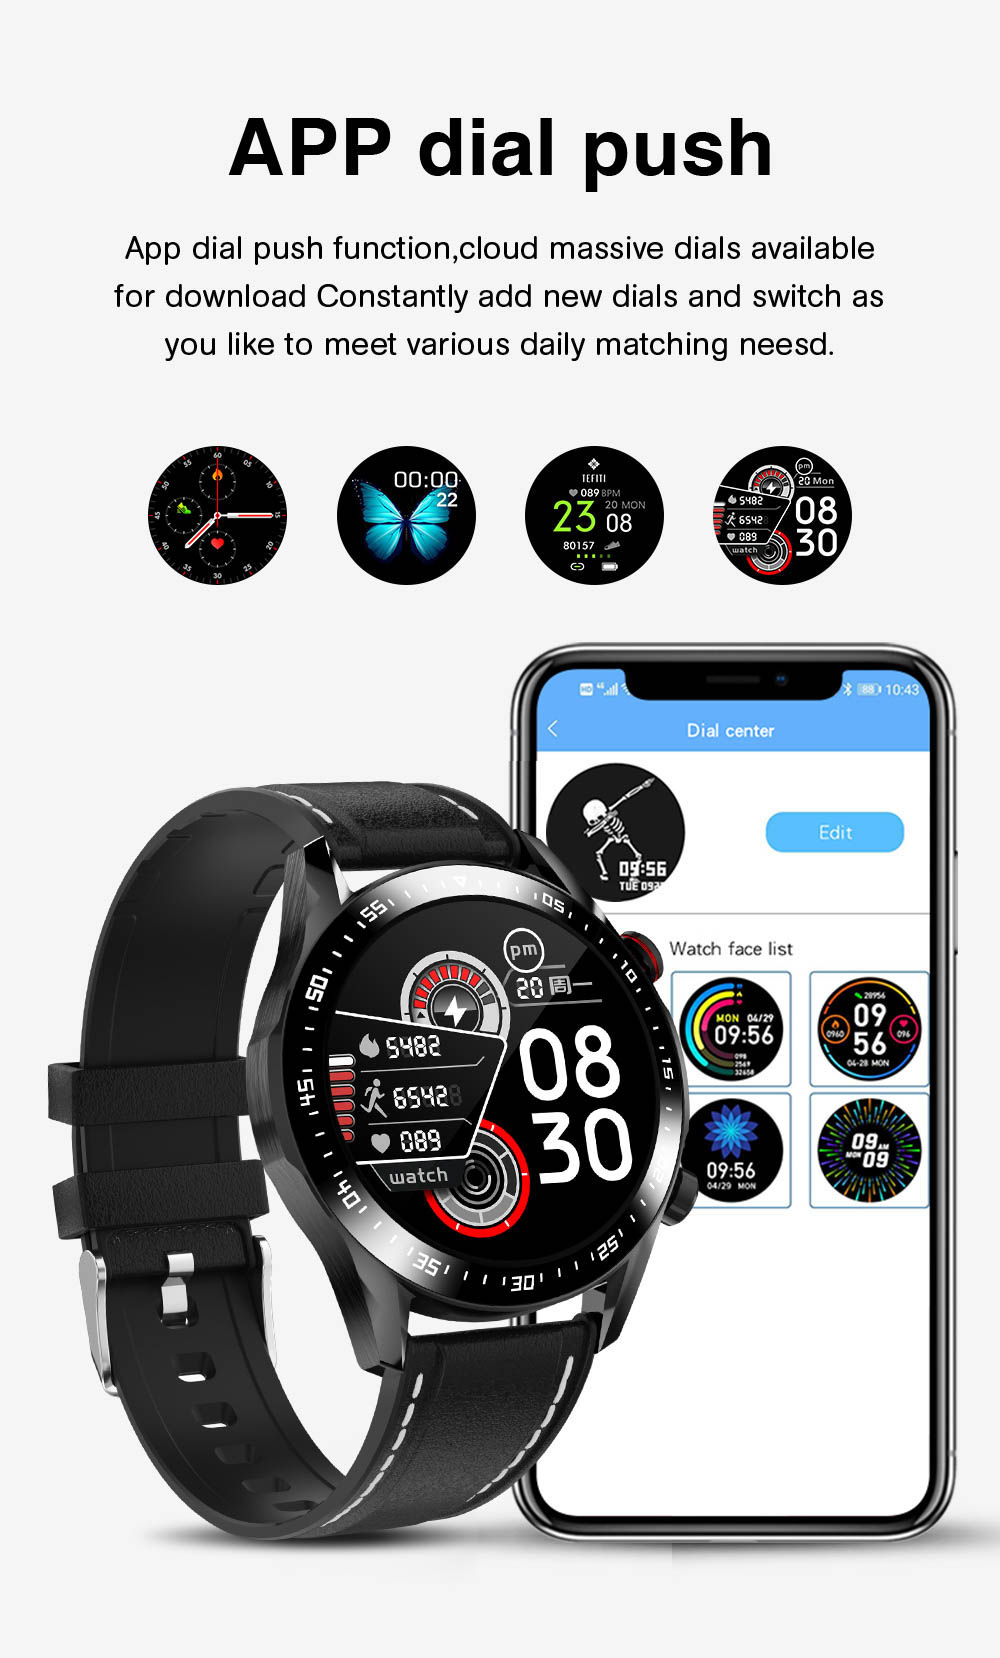 Ha03704a3396048cdb6b71db718b6516fA E1-2 Smart Watch Men Bluetooth Call Custom Dial Full Touch Screen Waterproof Smartwatch For Android IOS Sports Fitness Tracker